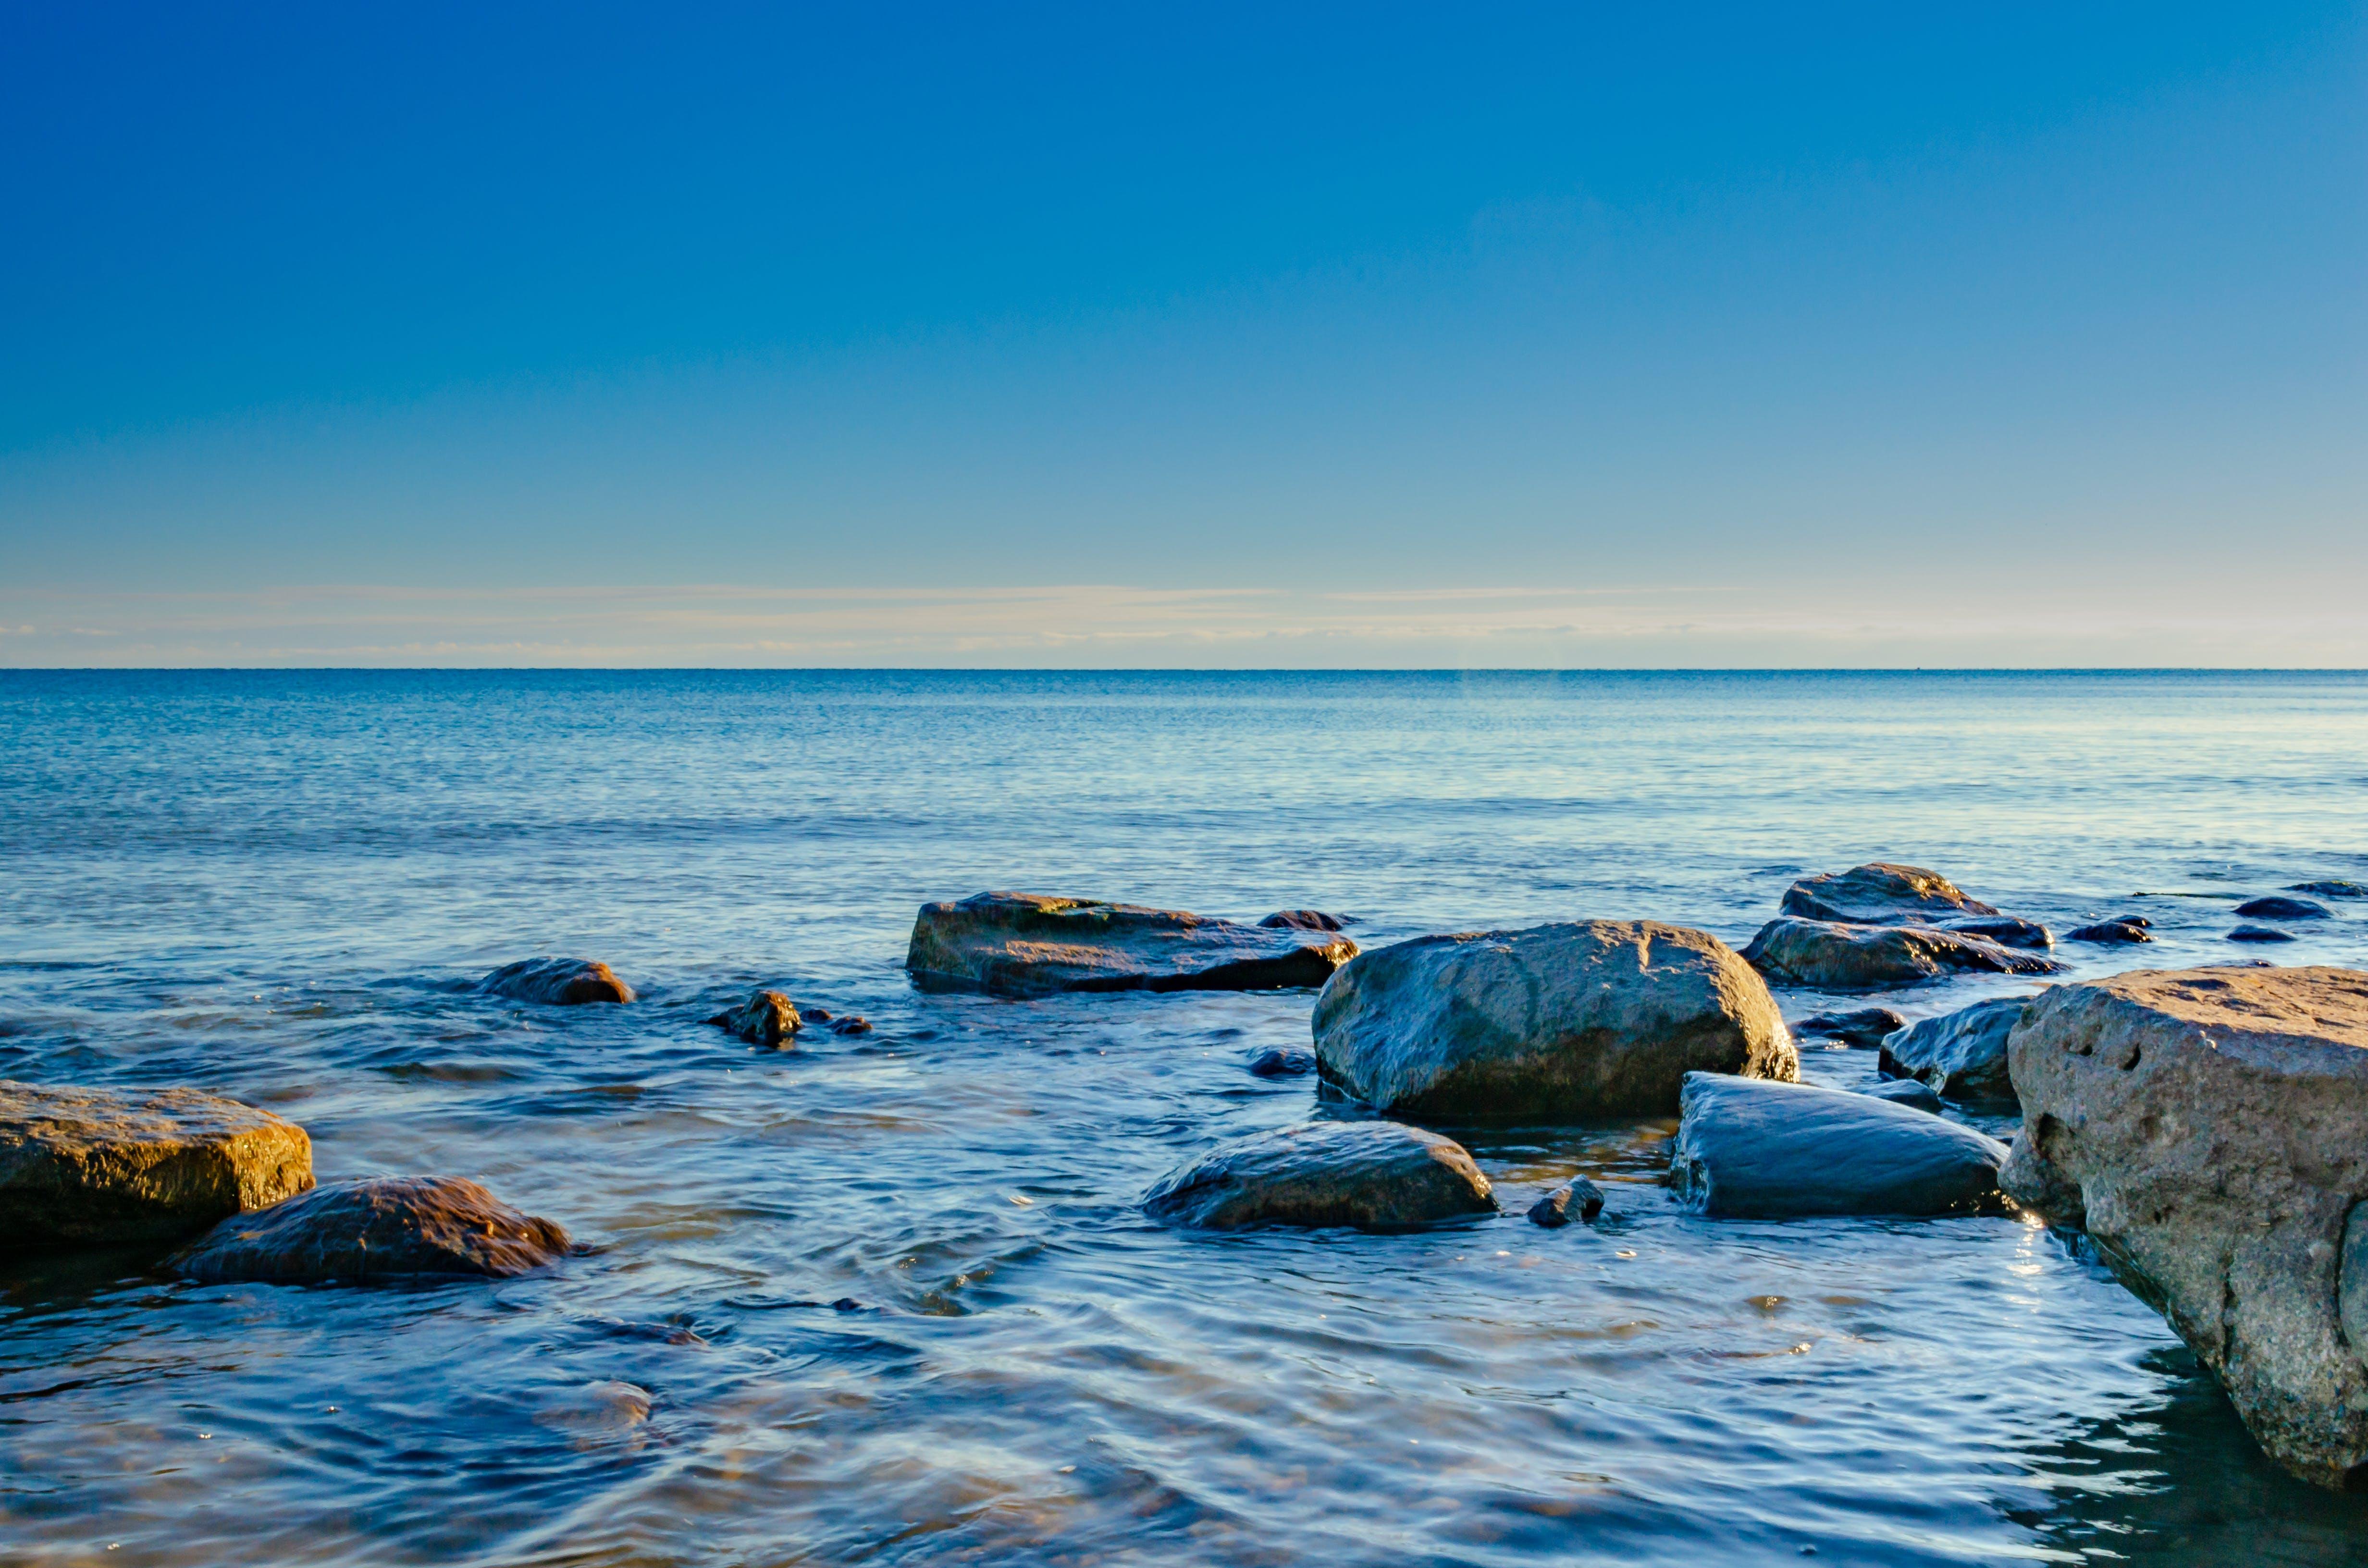 Kostenloses Stock Foto zu felsen, himmel, horizont, lake ontario